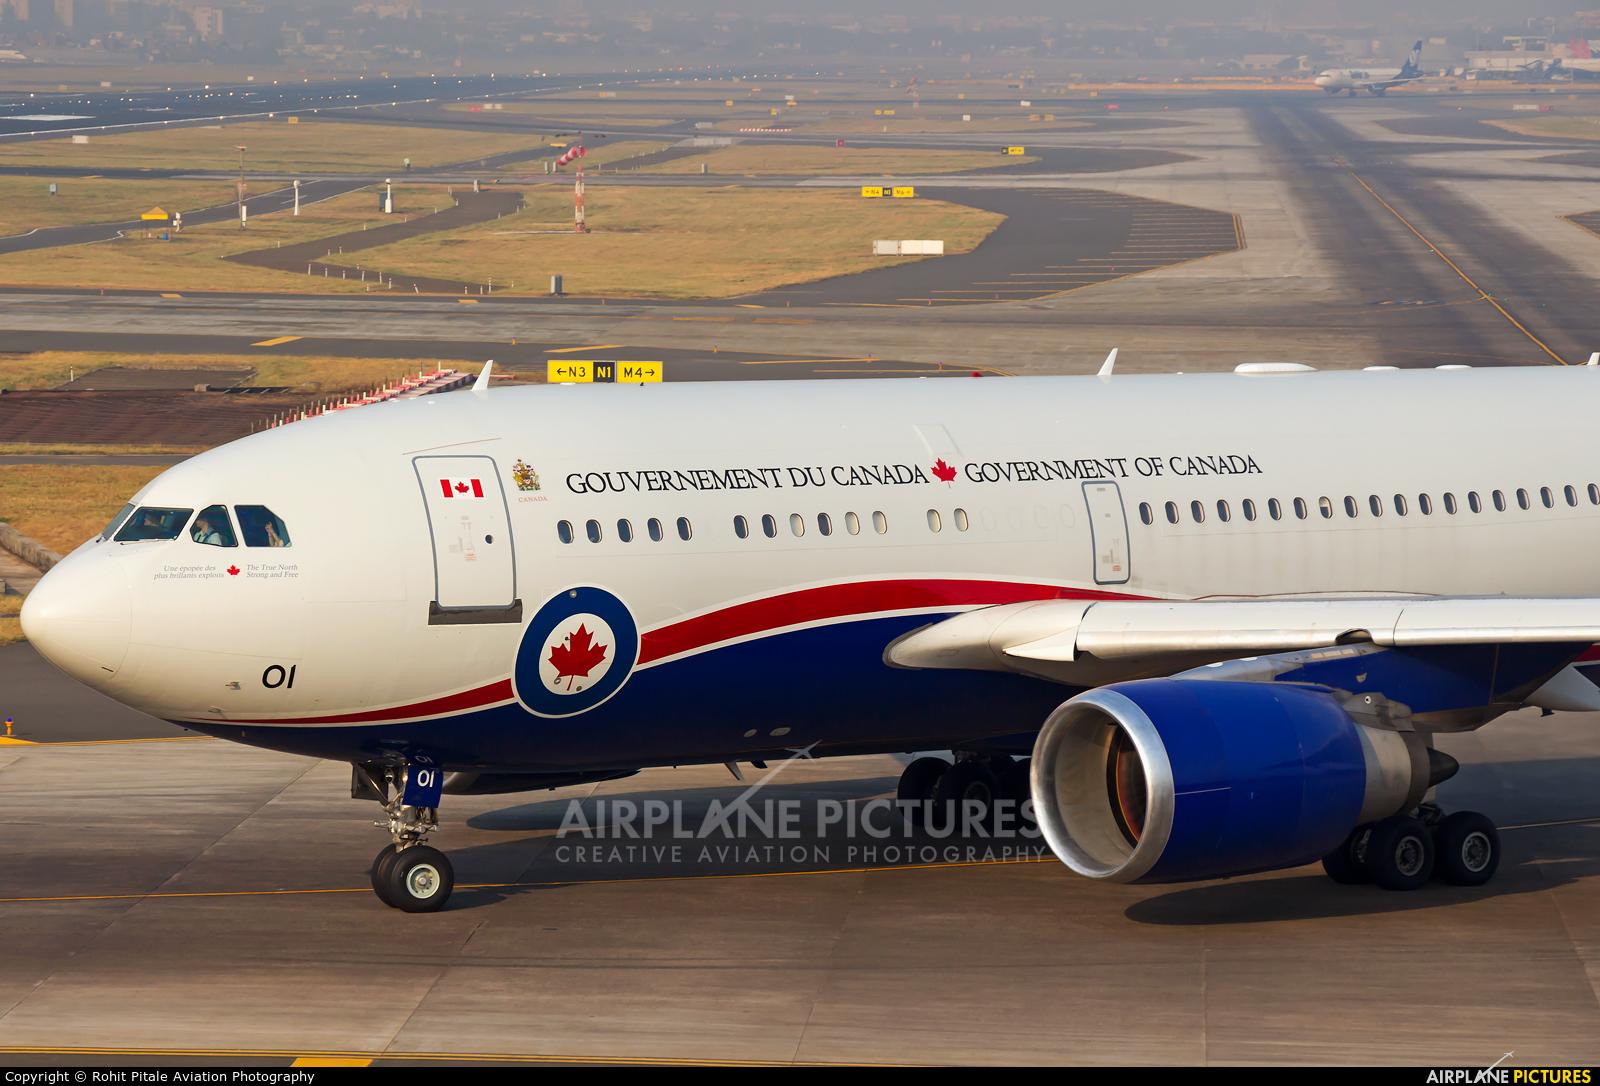 Canada - Air Force 15001 aircraft at Mumbai - Chhatrapati Shivaji Intl